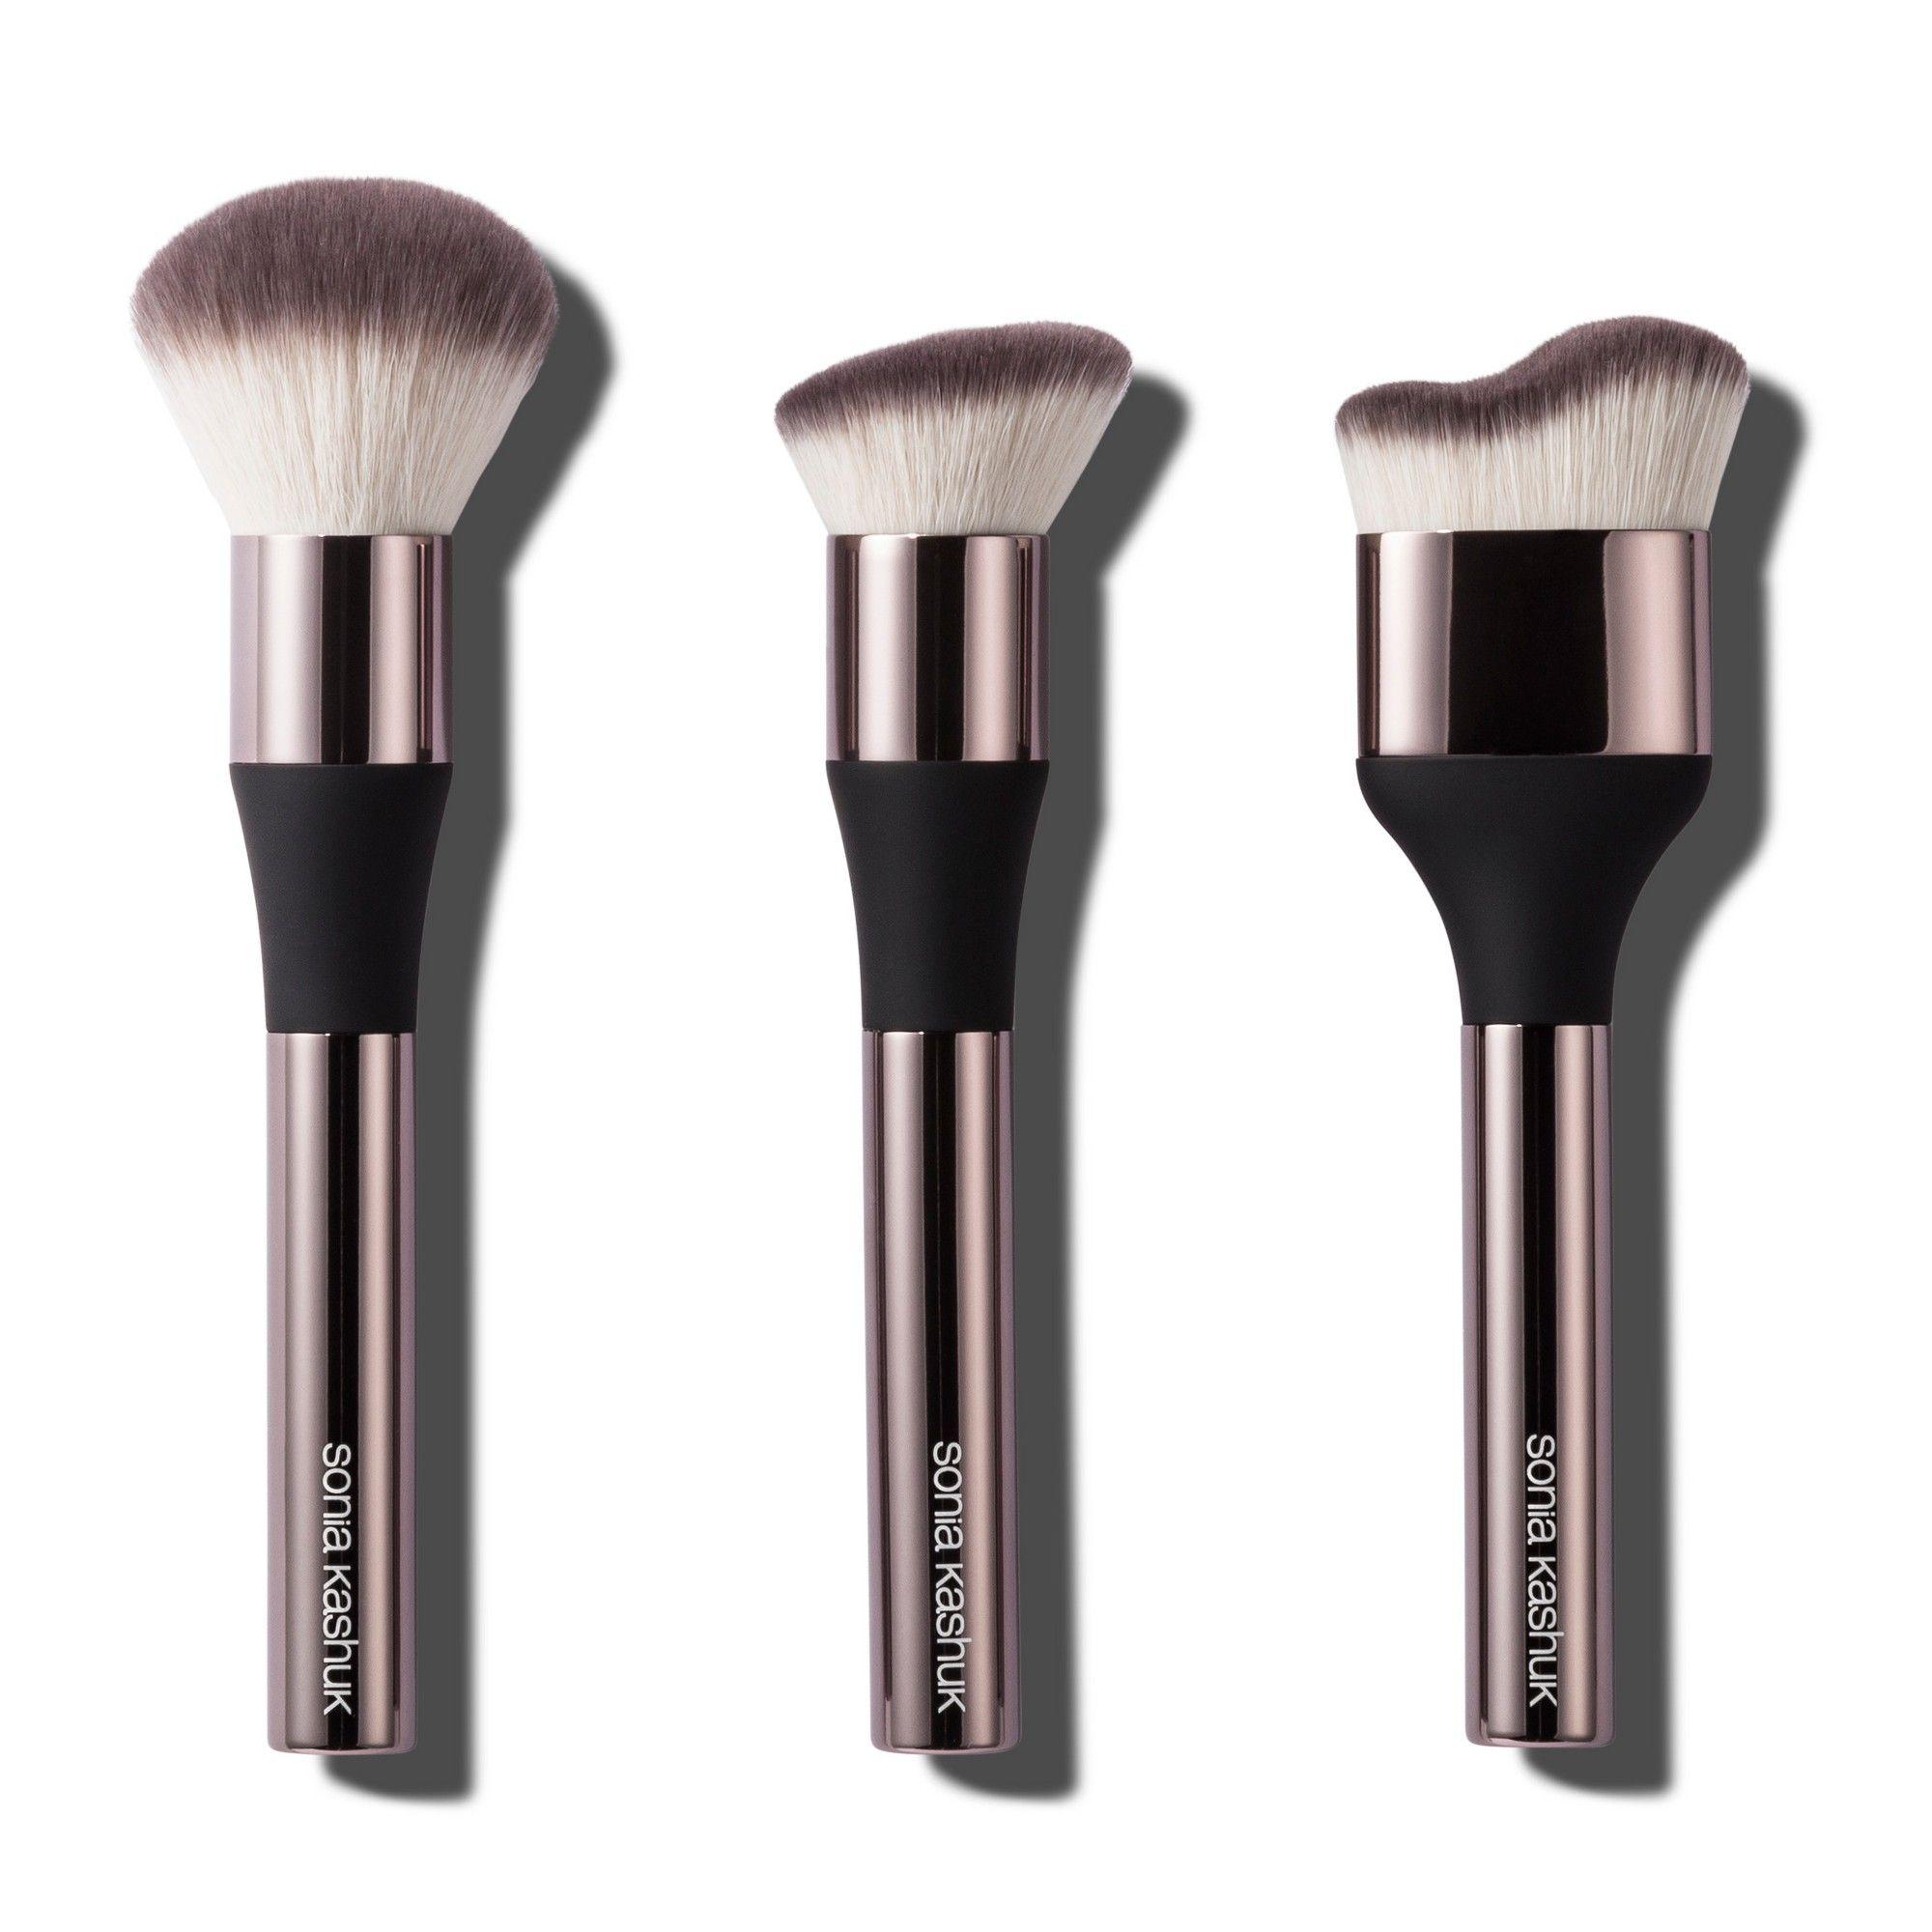 Sonia Kashuk Limited Edition 3pc Gilded Brush Set Target